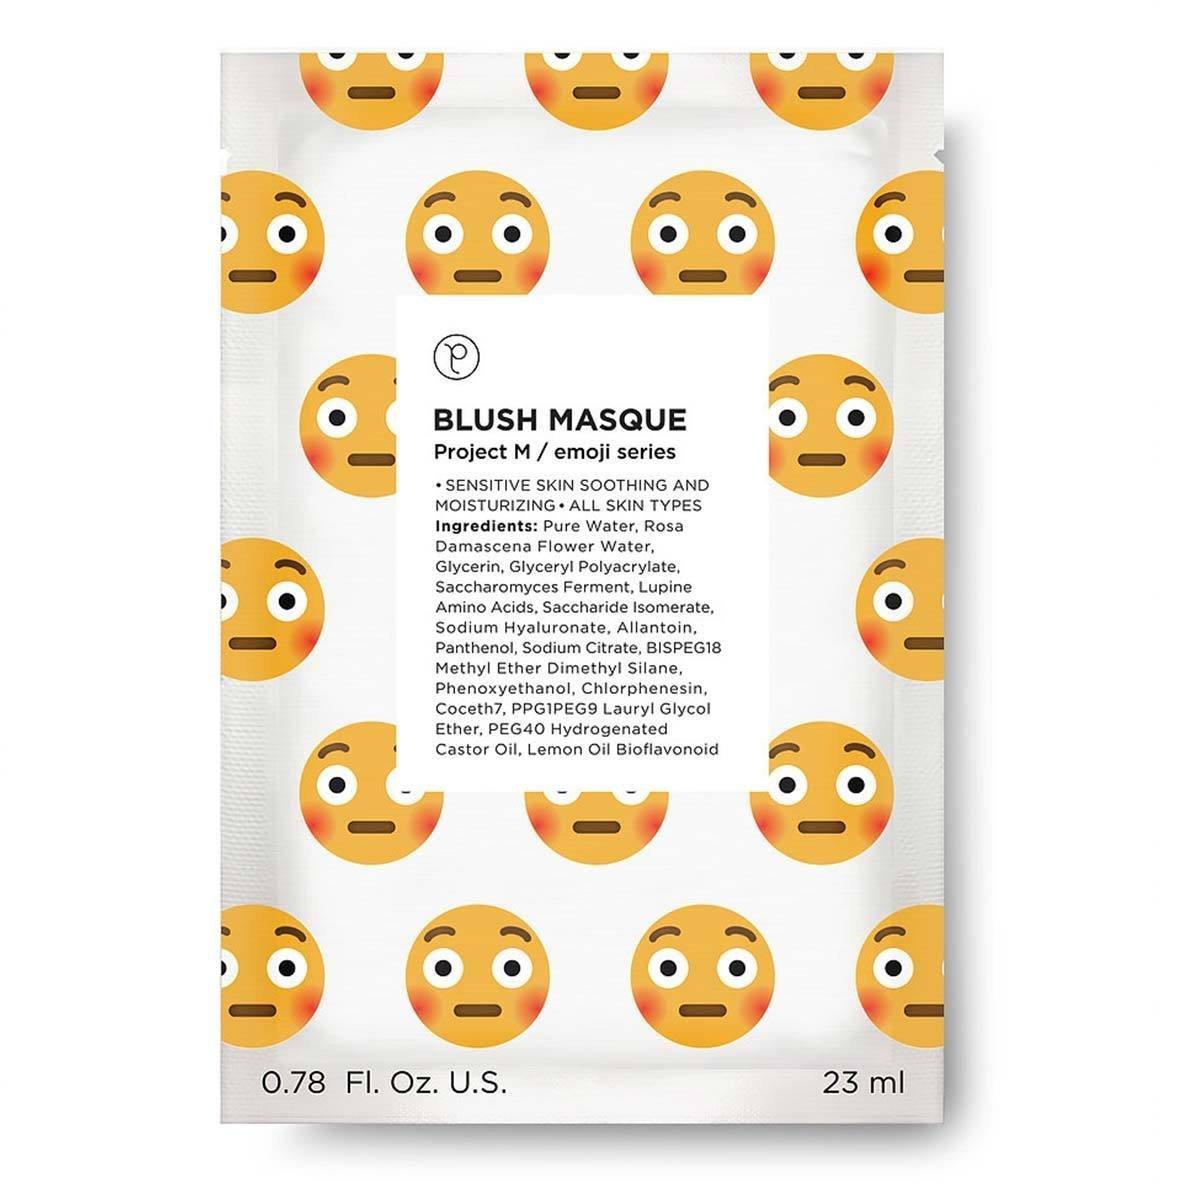 PETITE AMIE Blush Emoji Masque (Single)